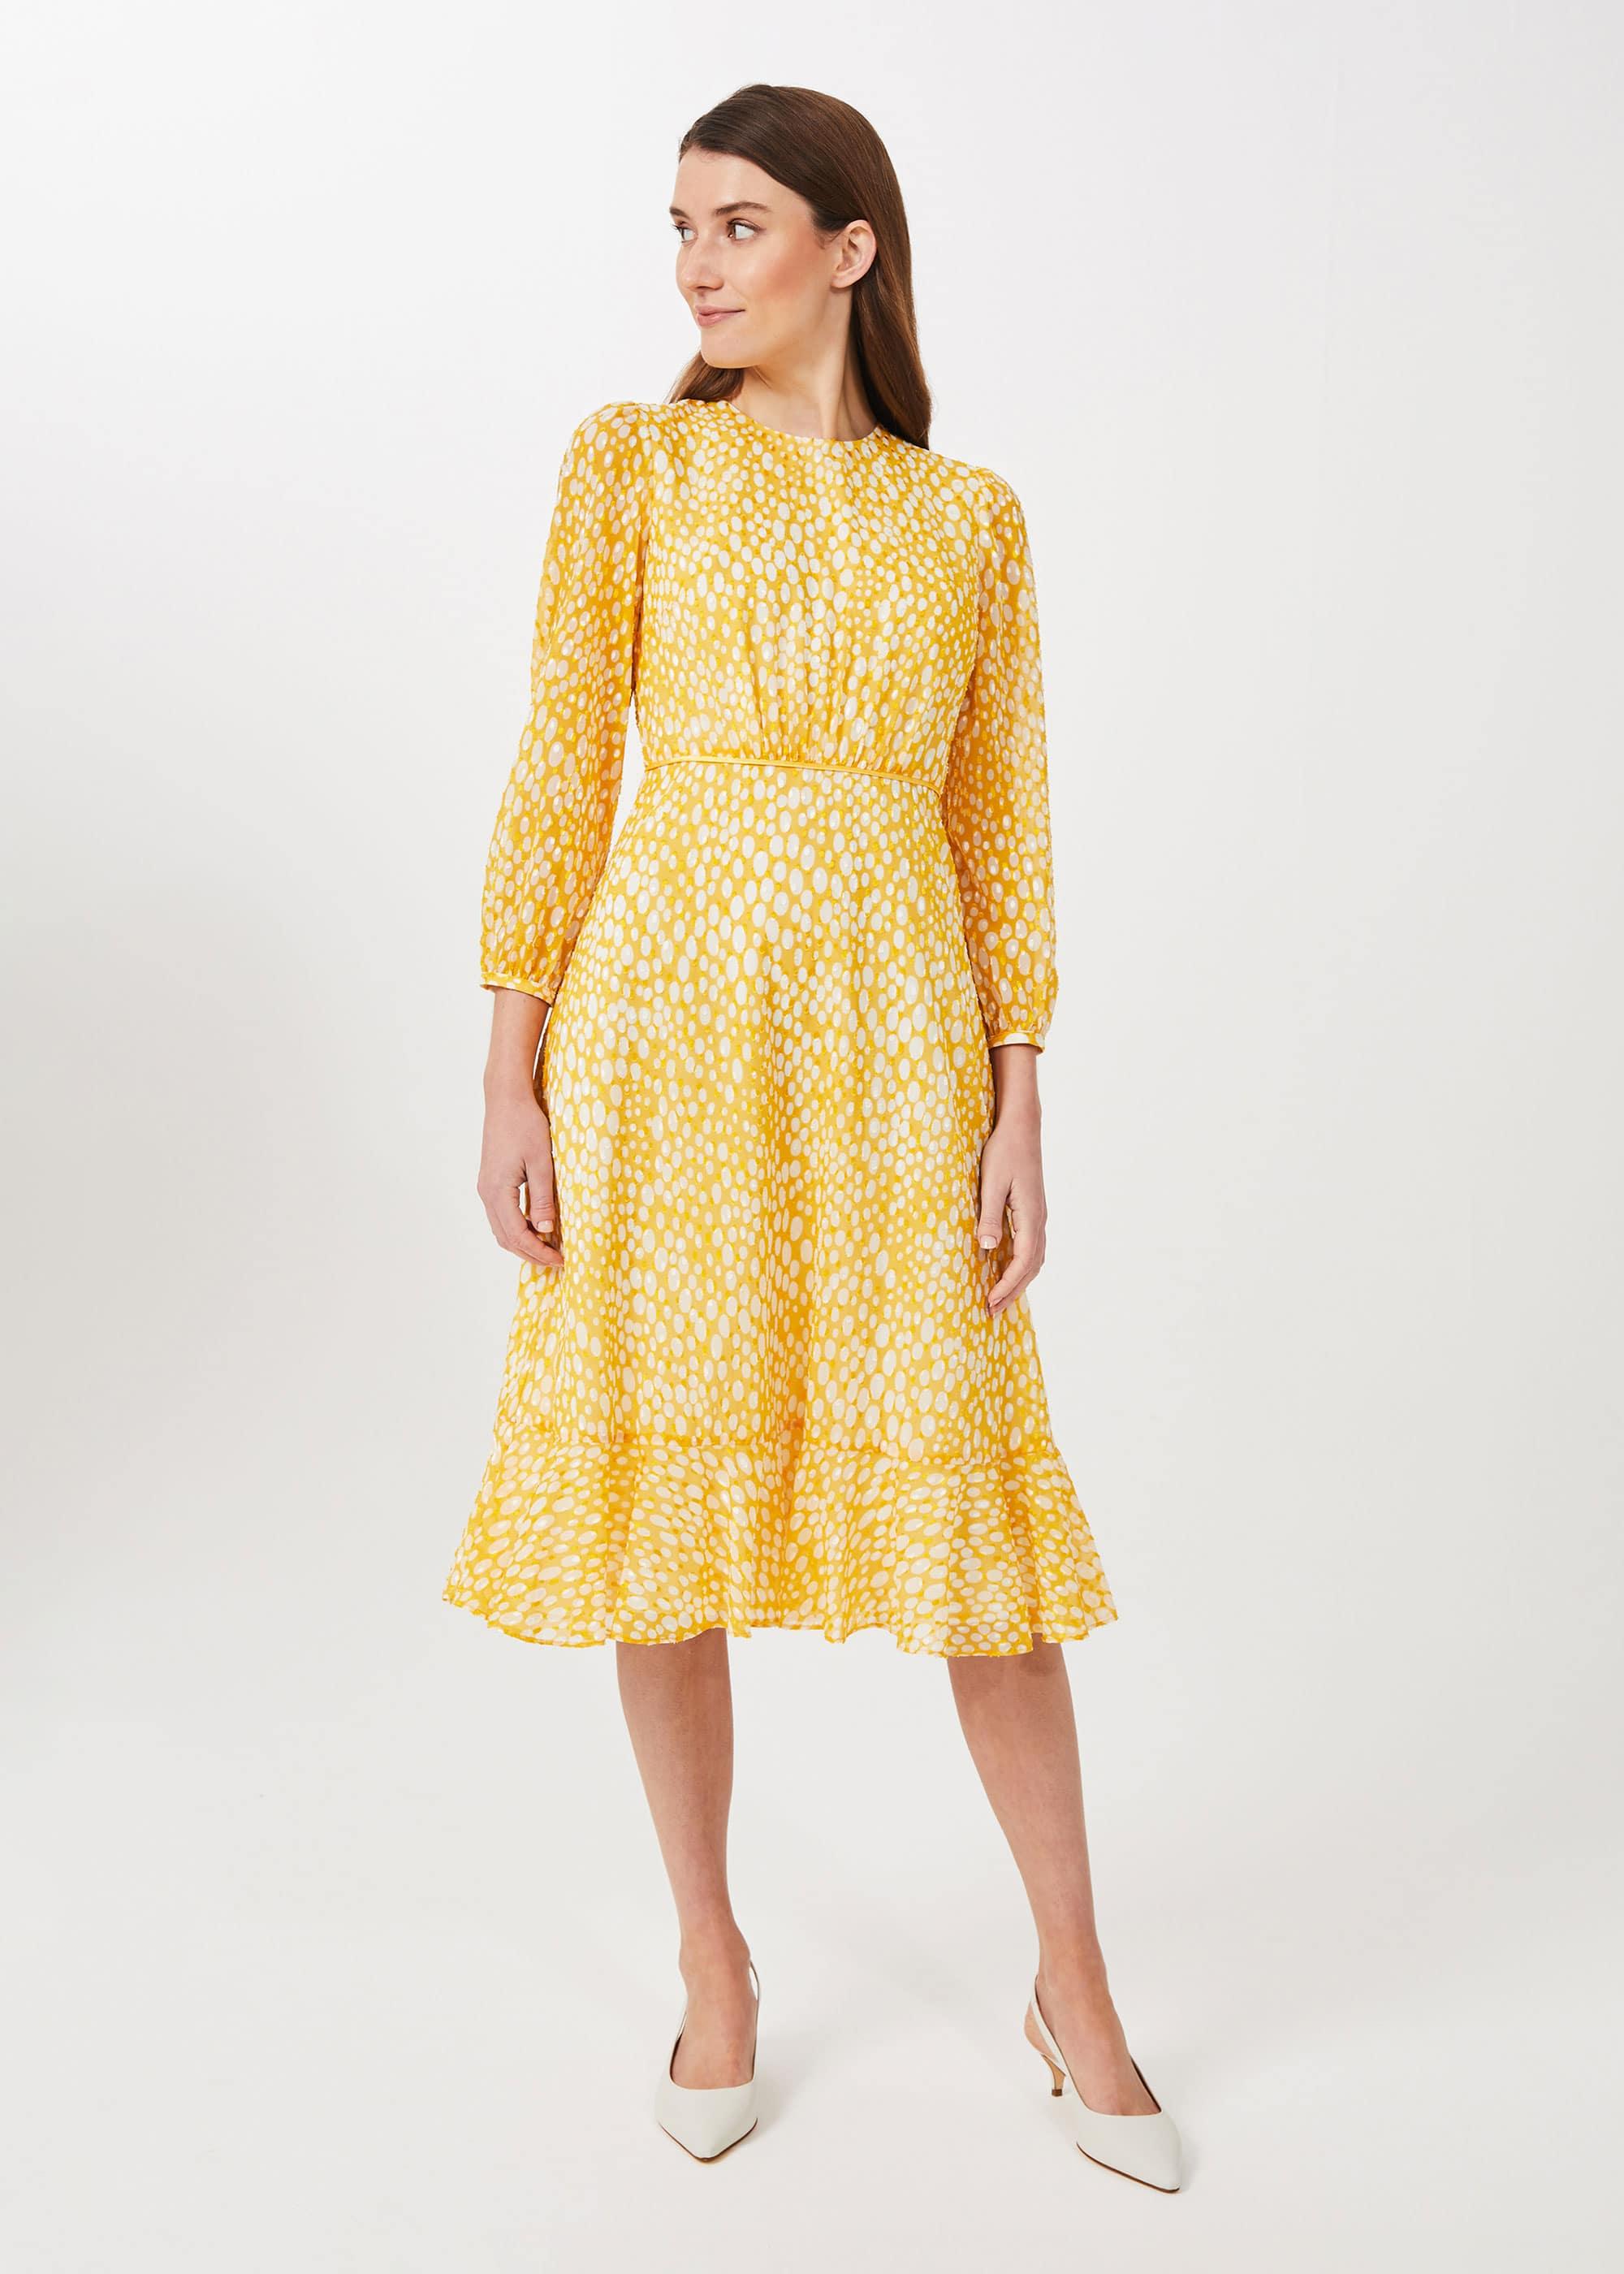 Hobbs Women Lexi Jacquard Dress